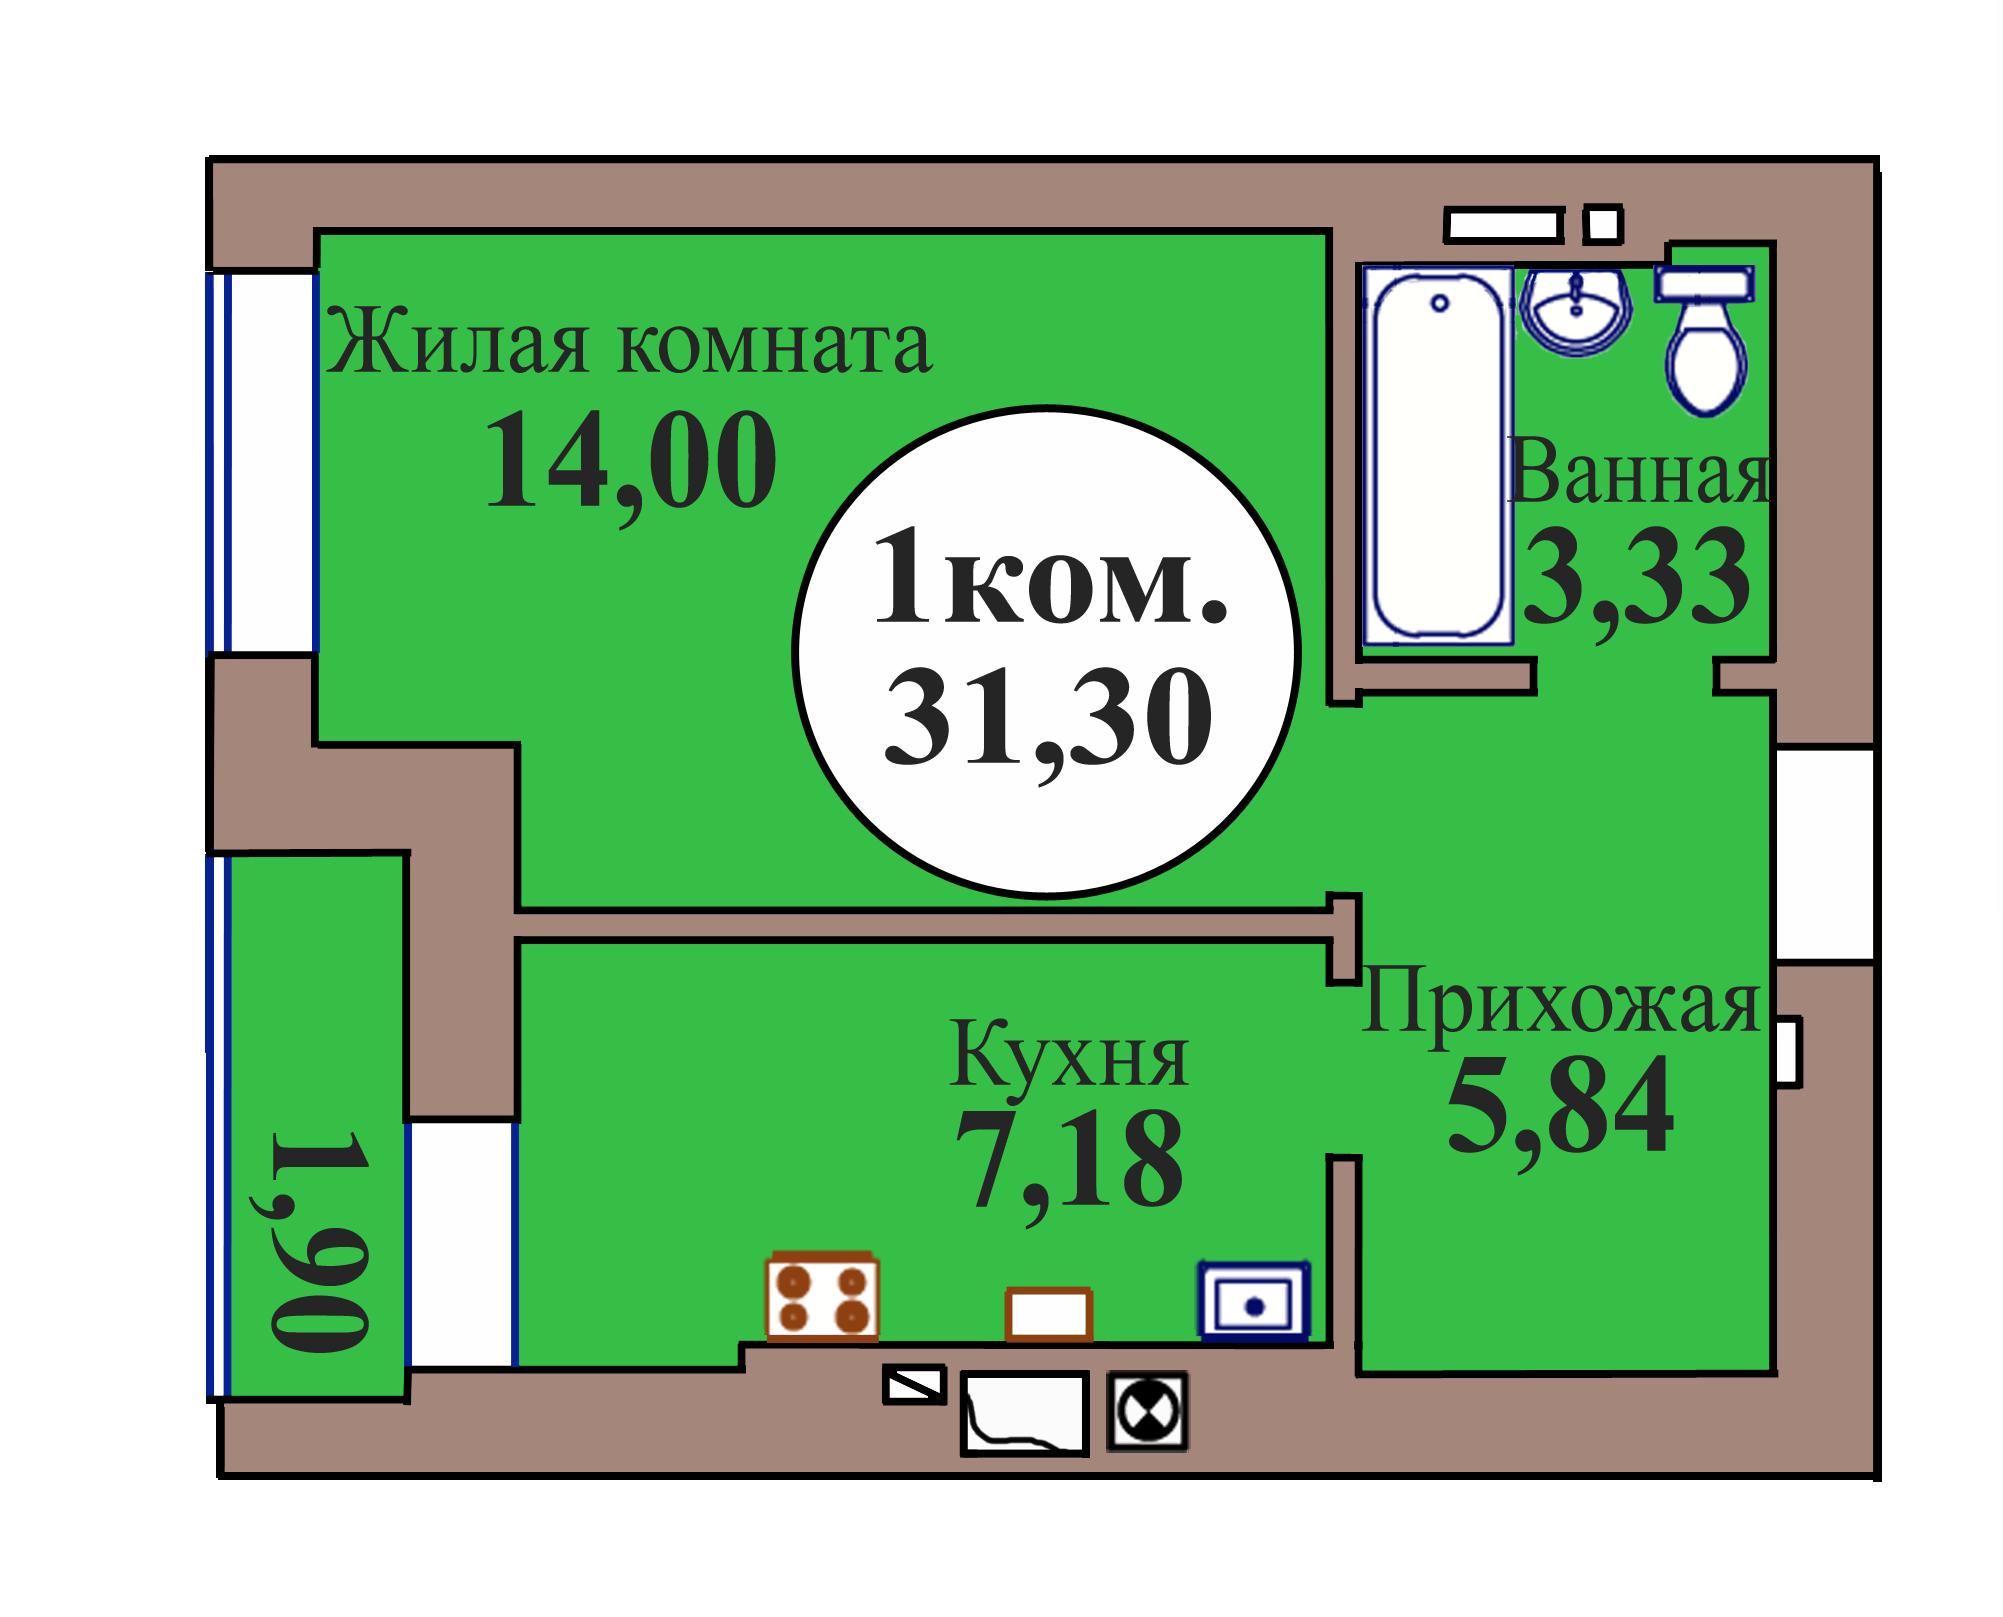 1-комн. кв. по пер. Калининградский, 5 кв. 11 в Калининграде